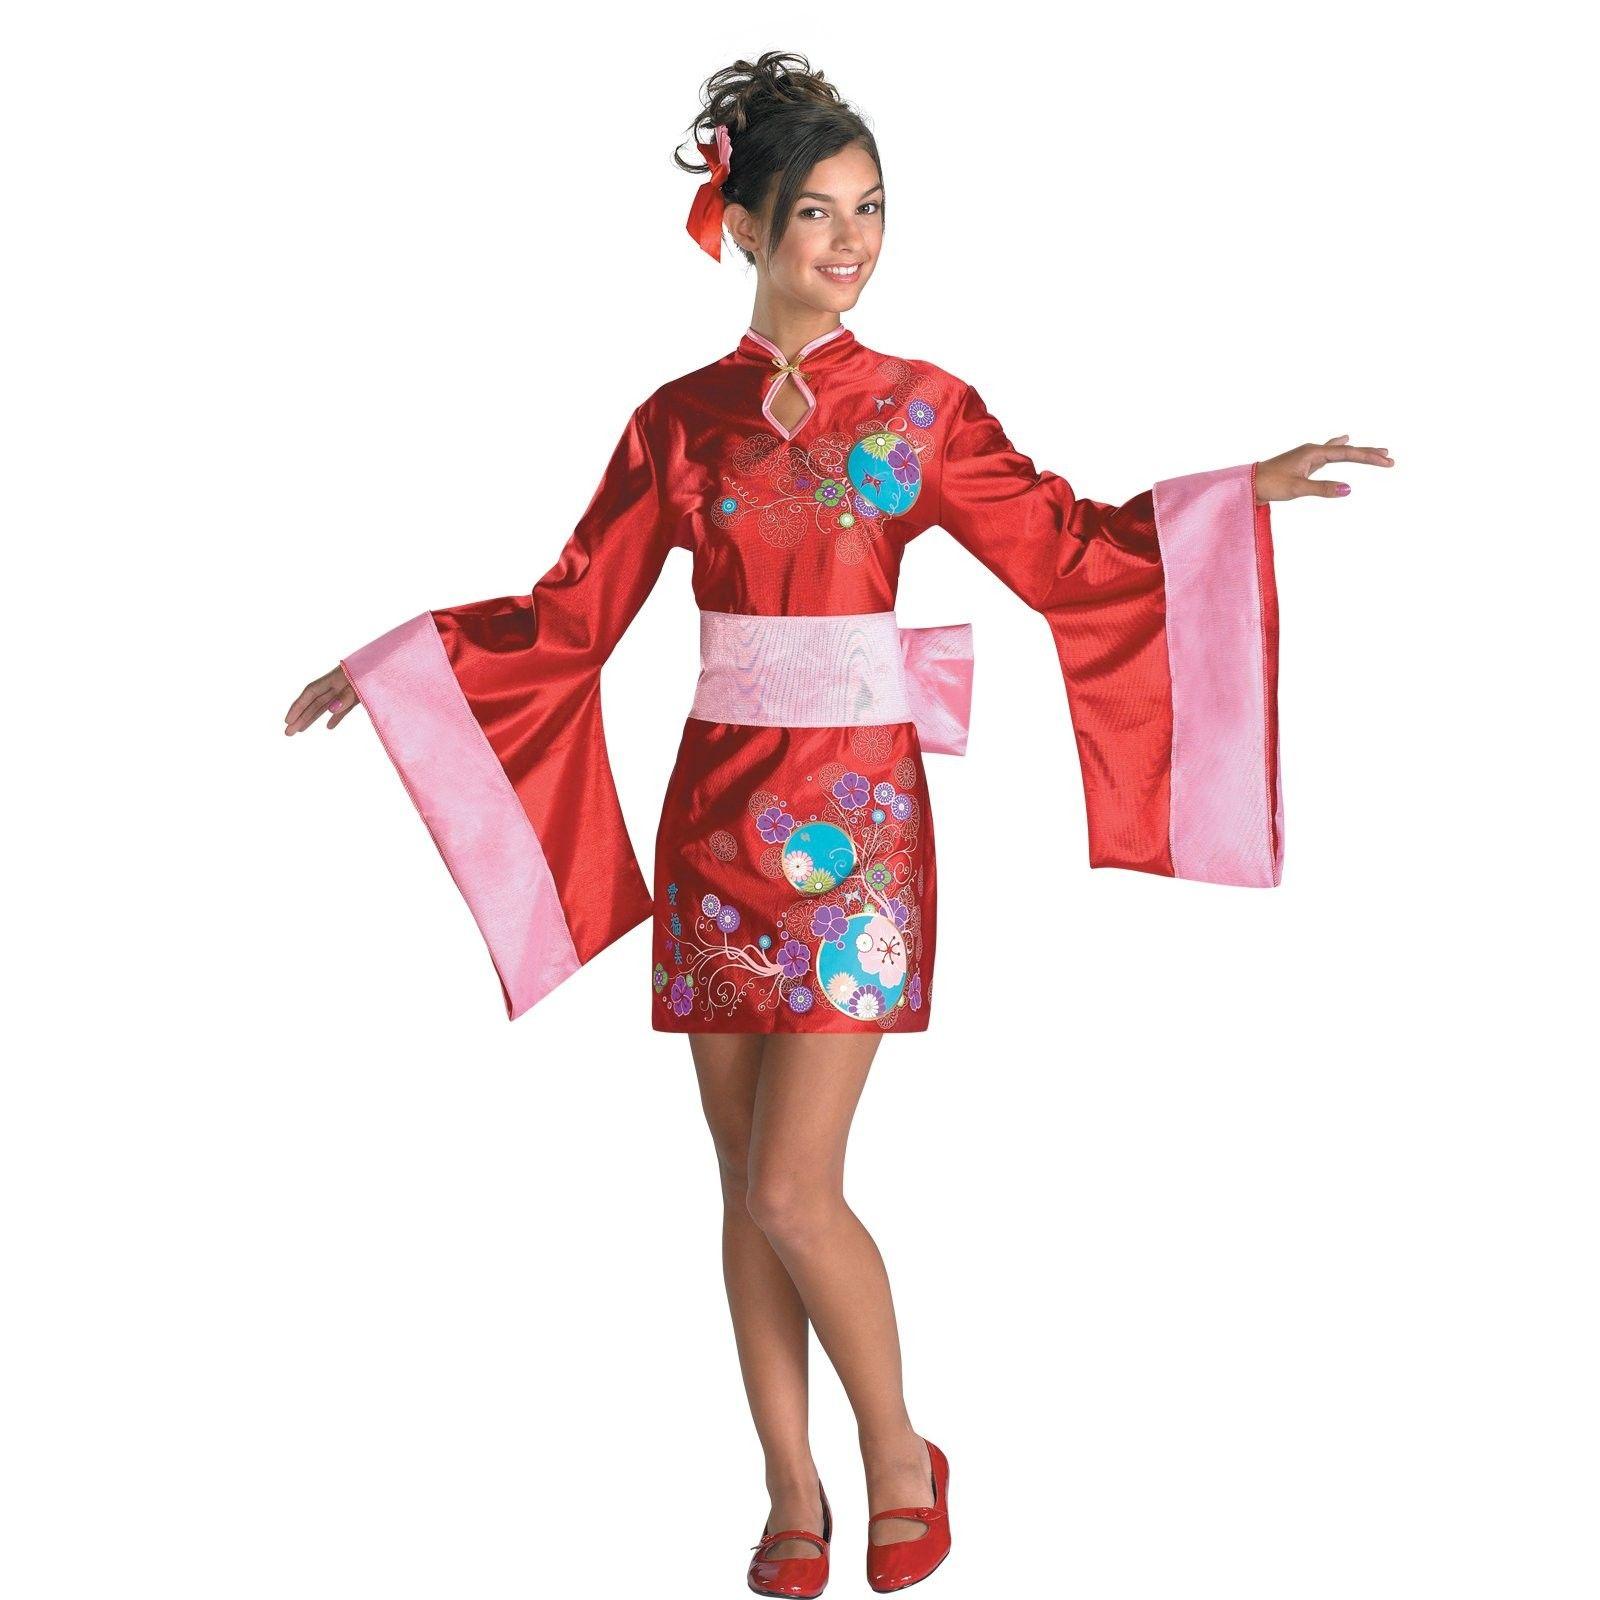 kimono kutie costume - includes: dress, obi belt, and hair